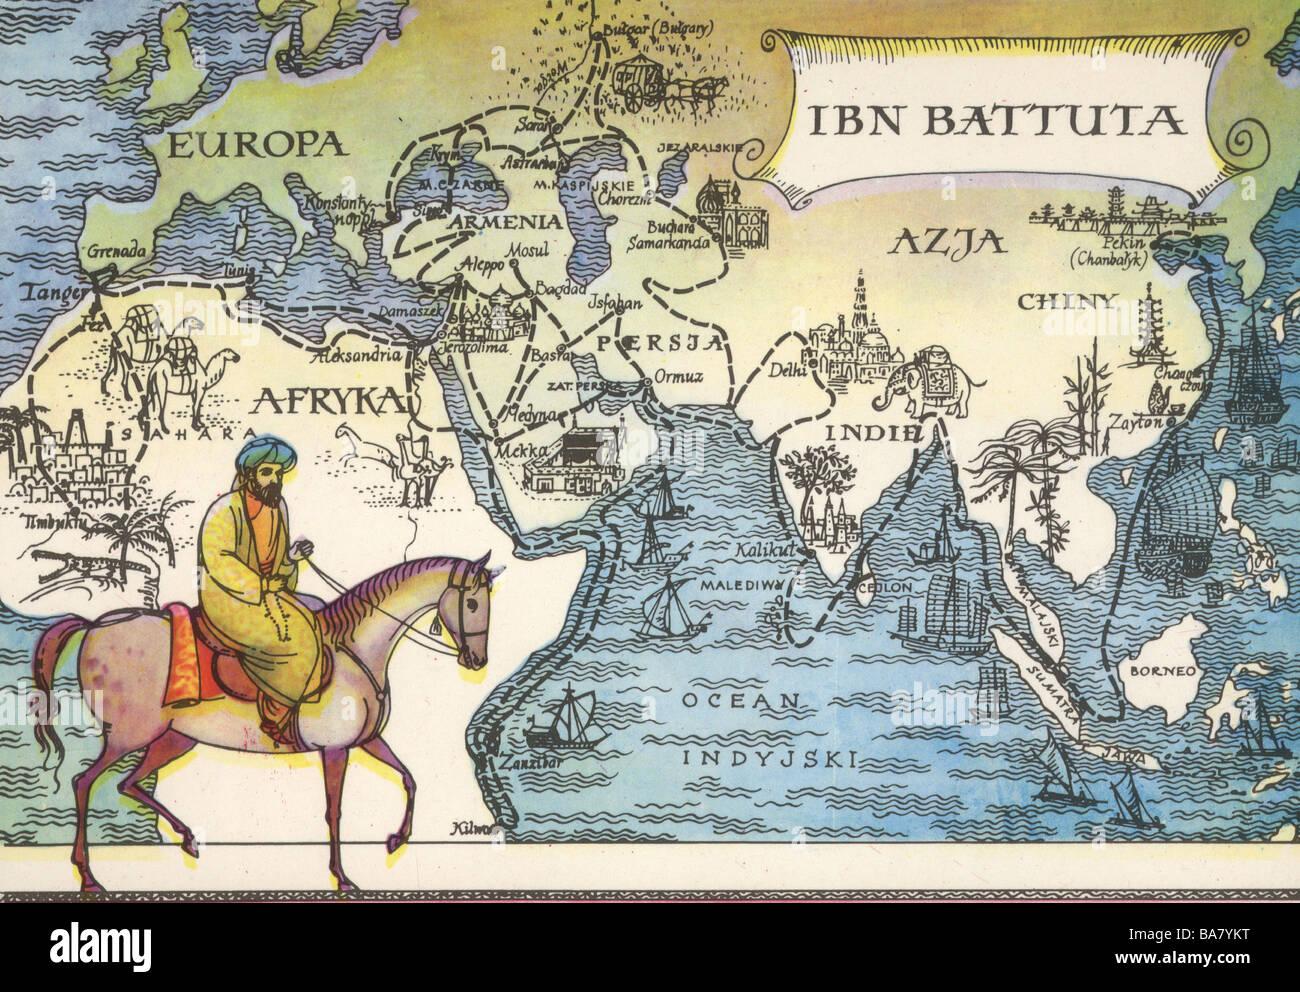 https://c8.alamy.com/comp/BA7YKT/ibn-battuta-abu-abdullah-muhammad-421304-circa-1377-arabian-explorer-BA7YKT.jpg